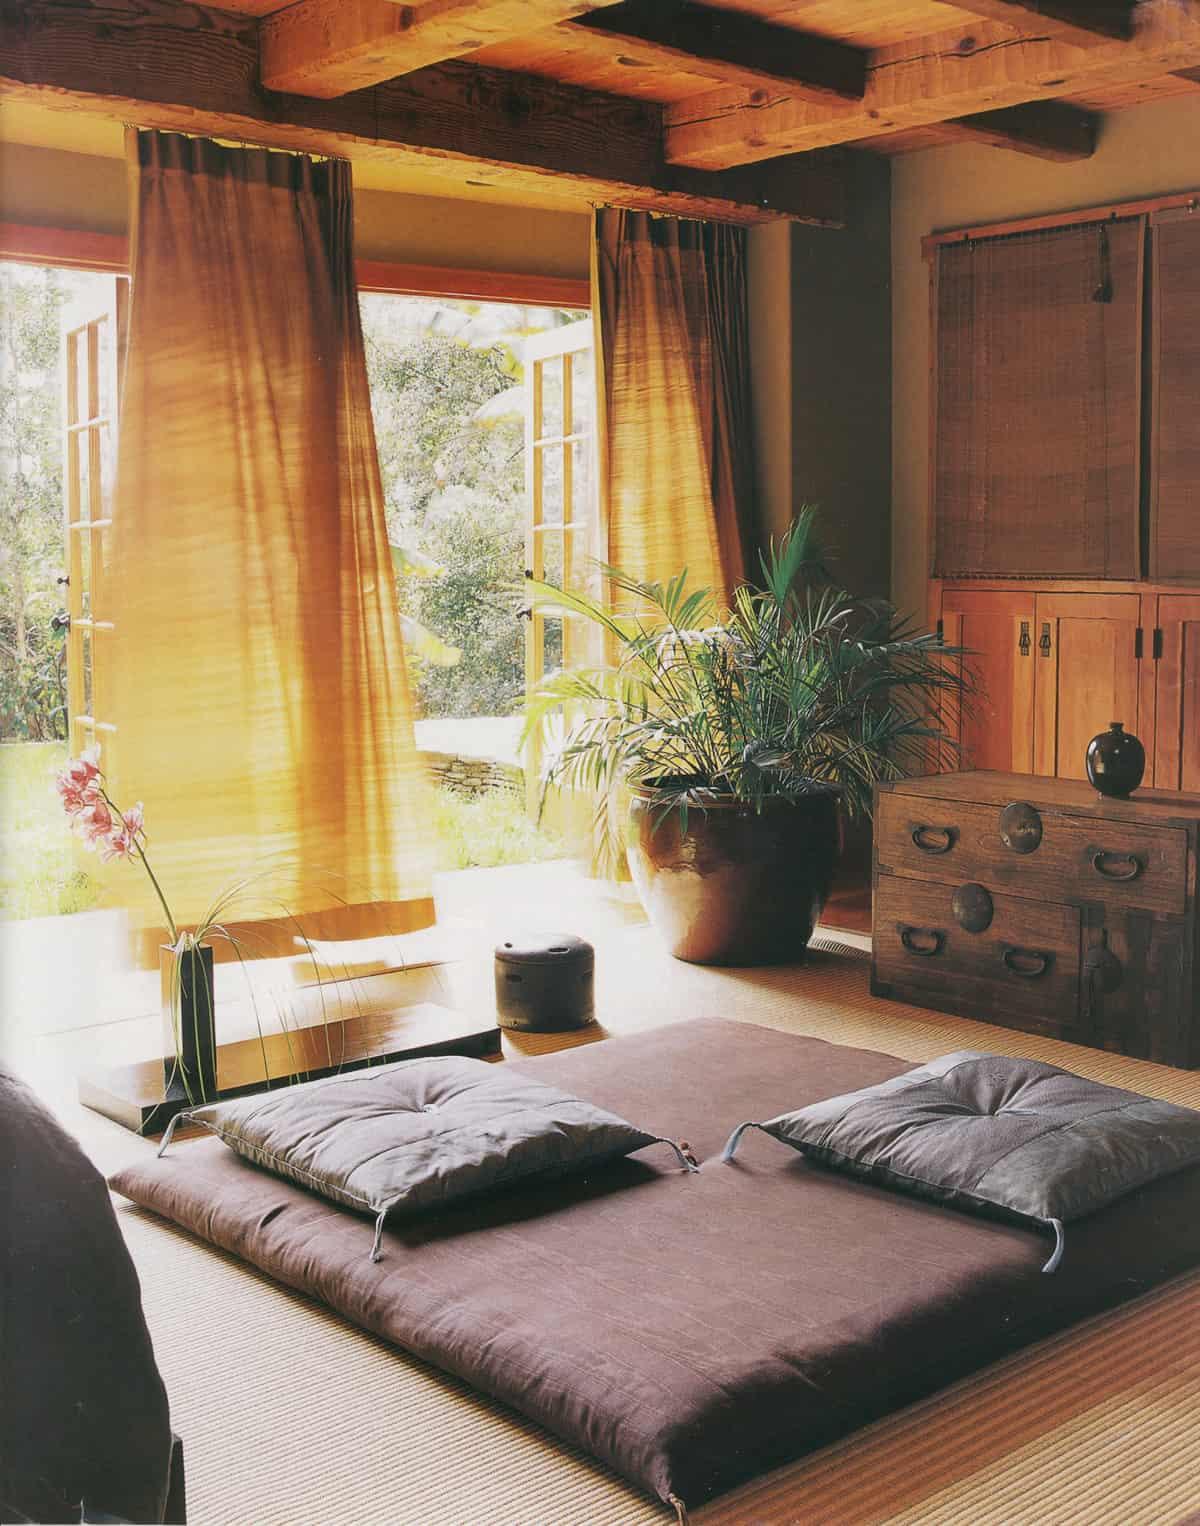 infront of window